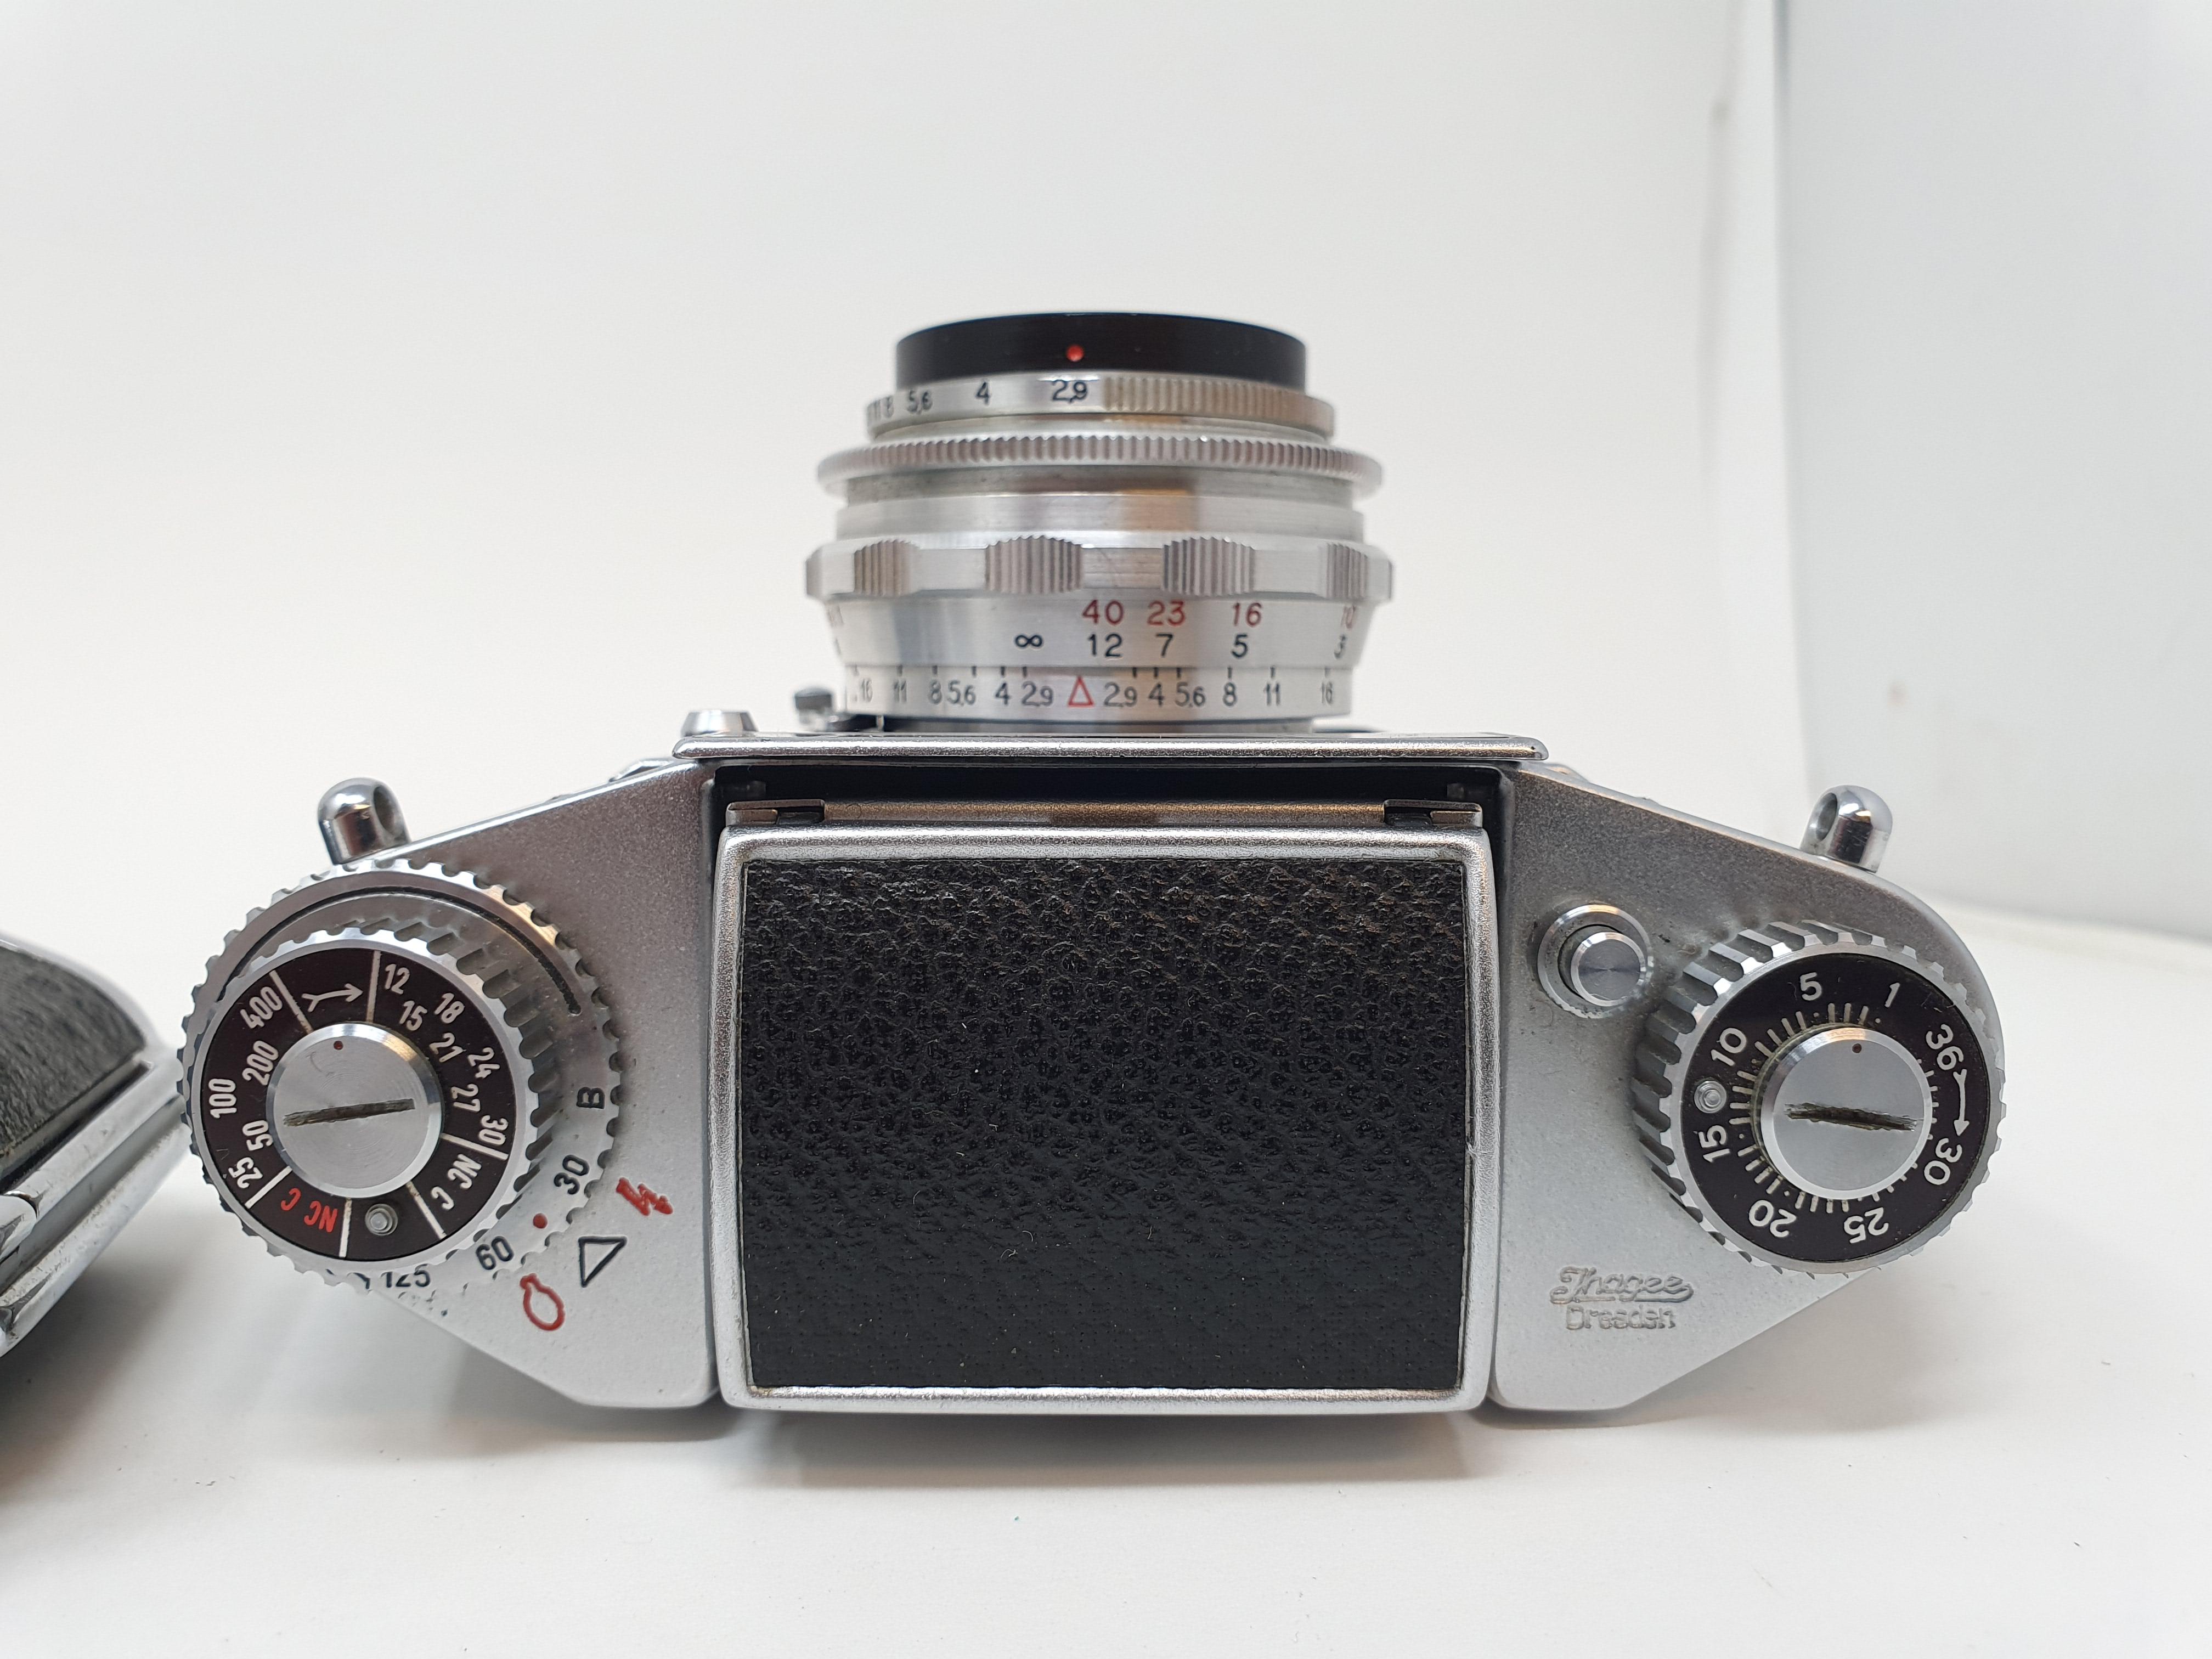 An Exakta Varex IIa camera, Varex IIb camera body, and an Exa. I (3) Provenance: Part of a vast - Image 4 of 6